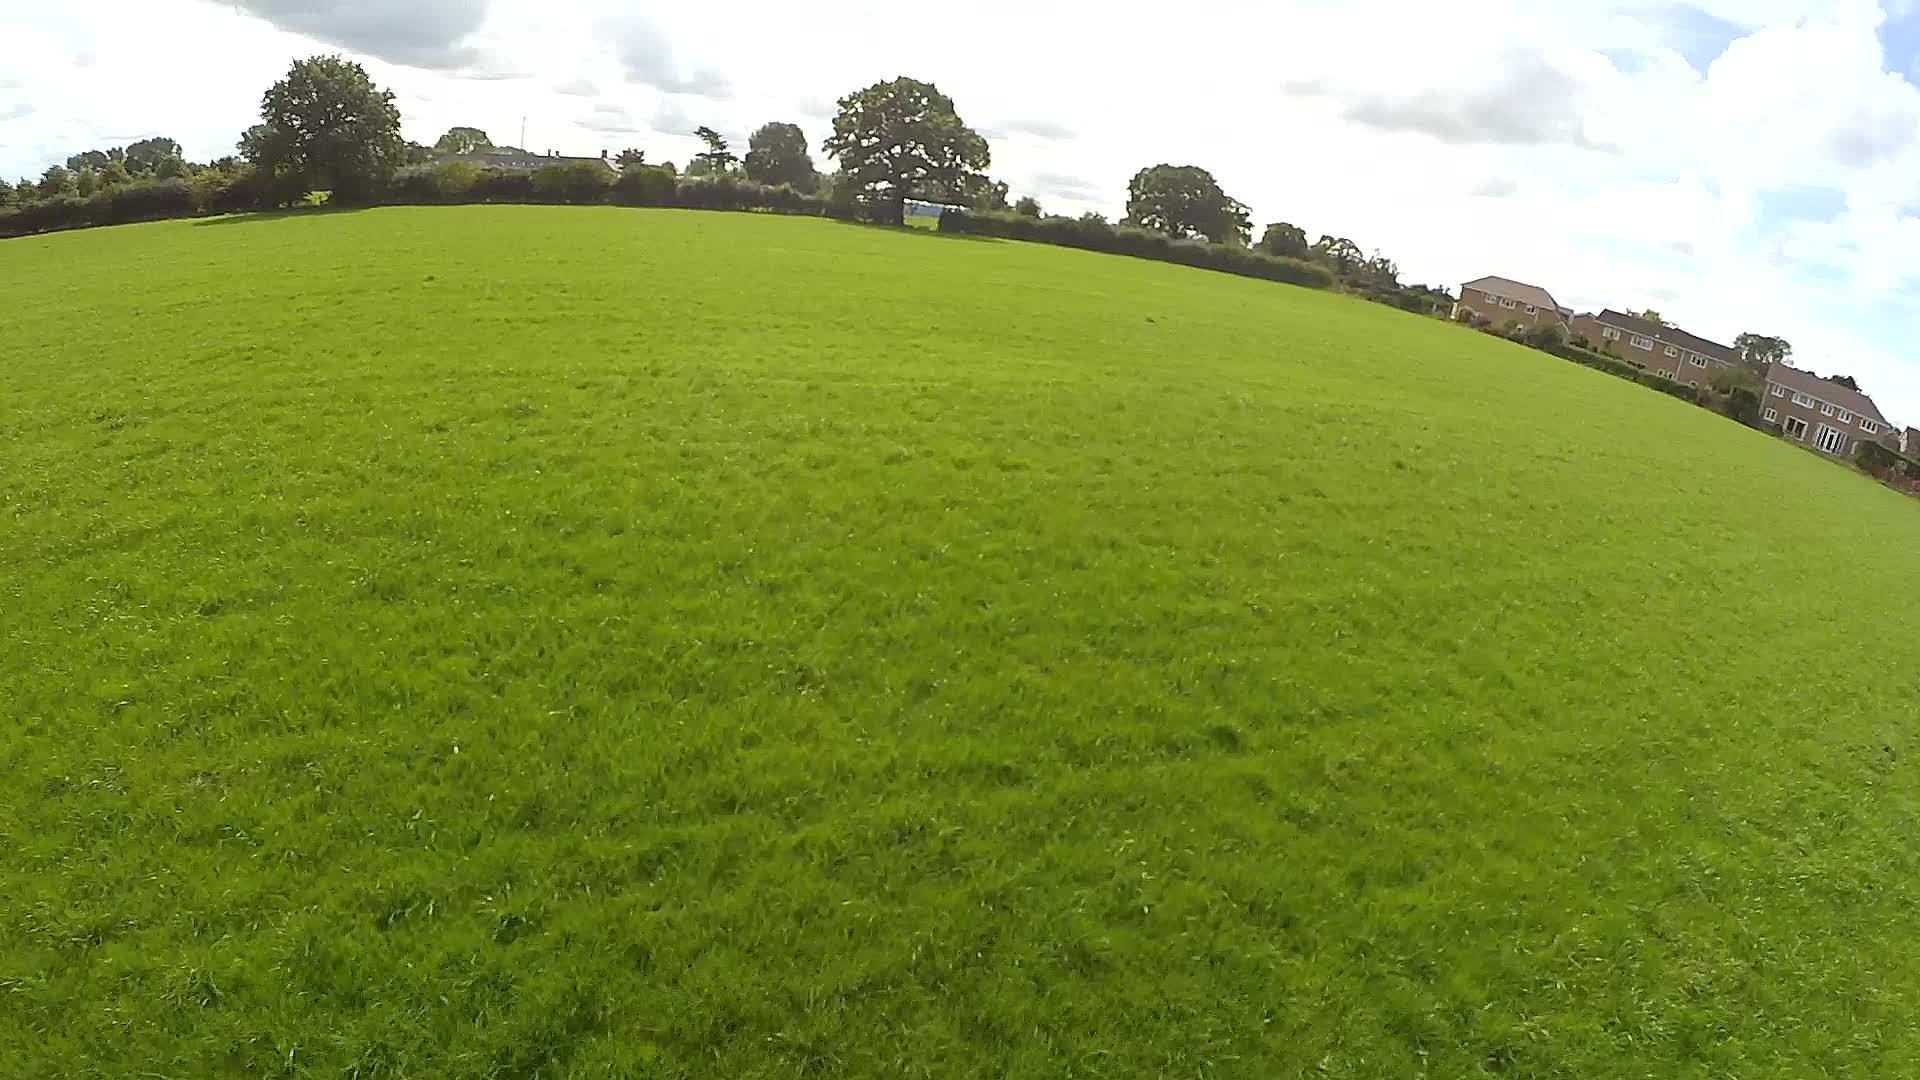 quadcopters, gate GIFs